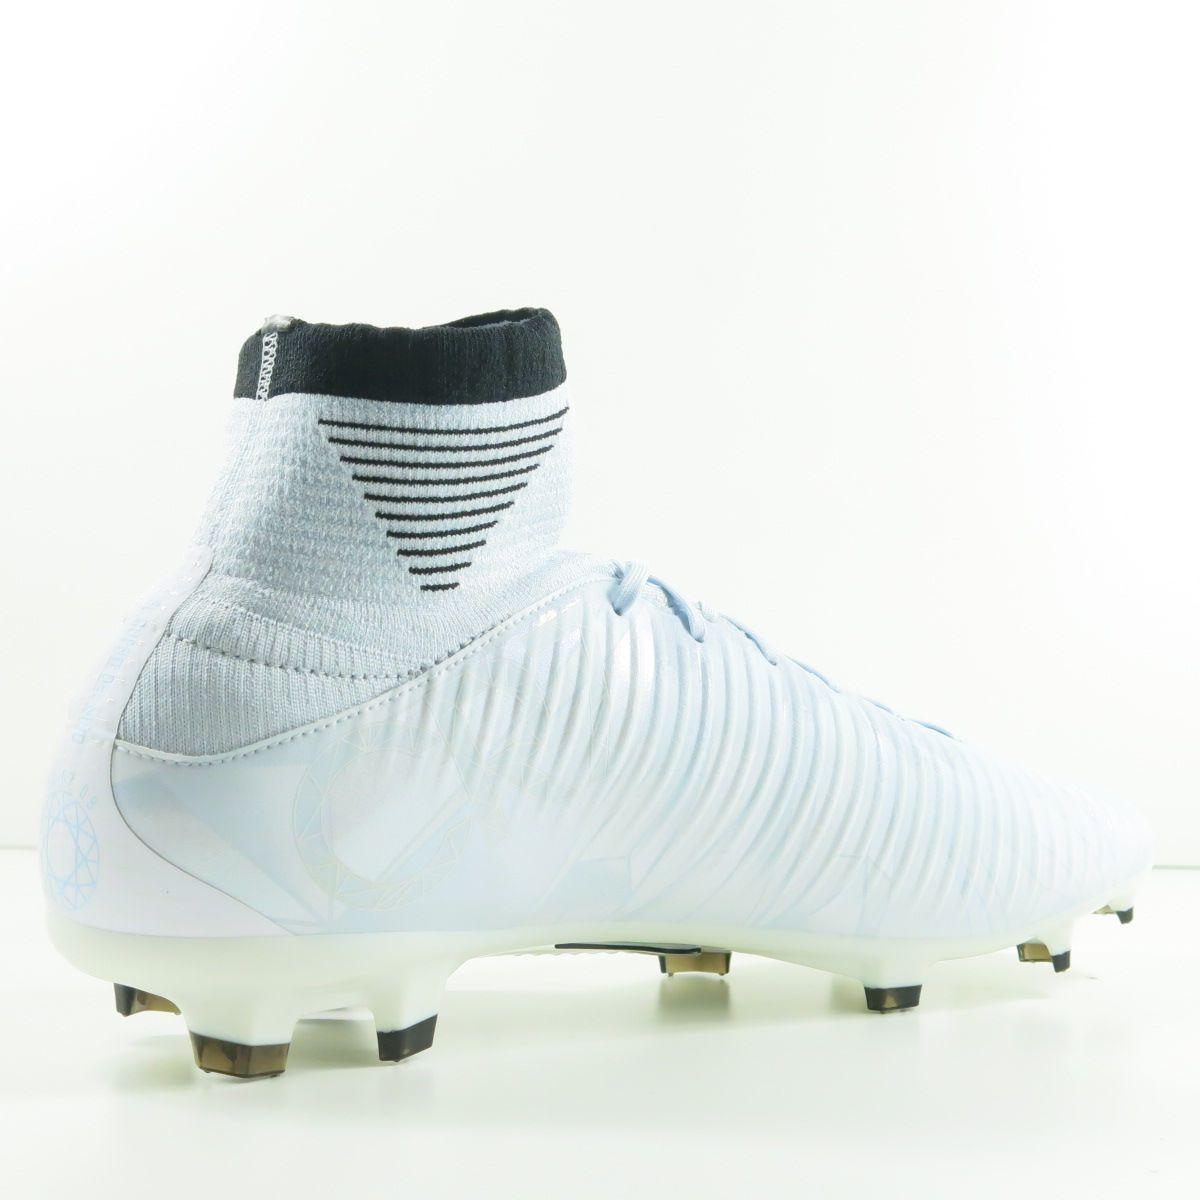 Chuteira Nike Mercurial Veloce CR7 FG